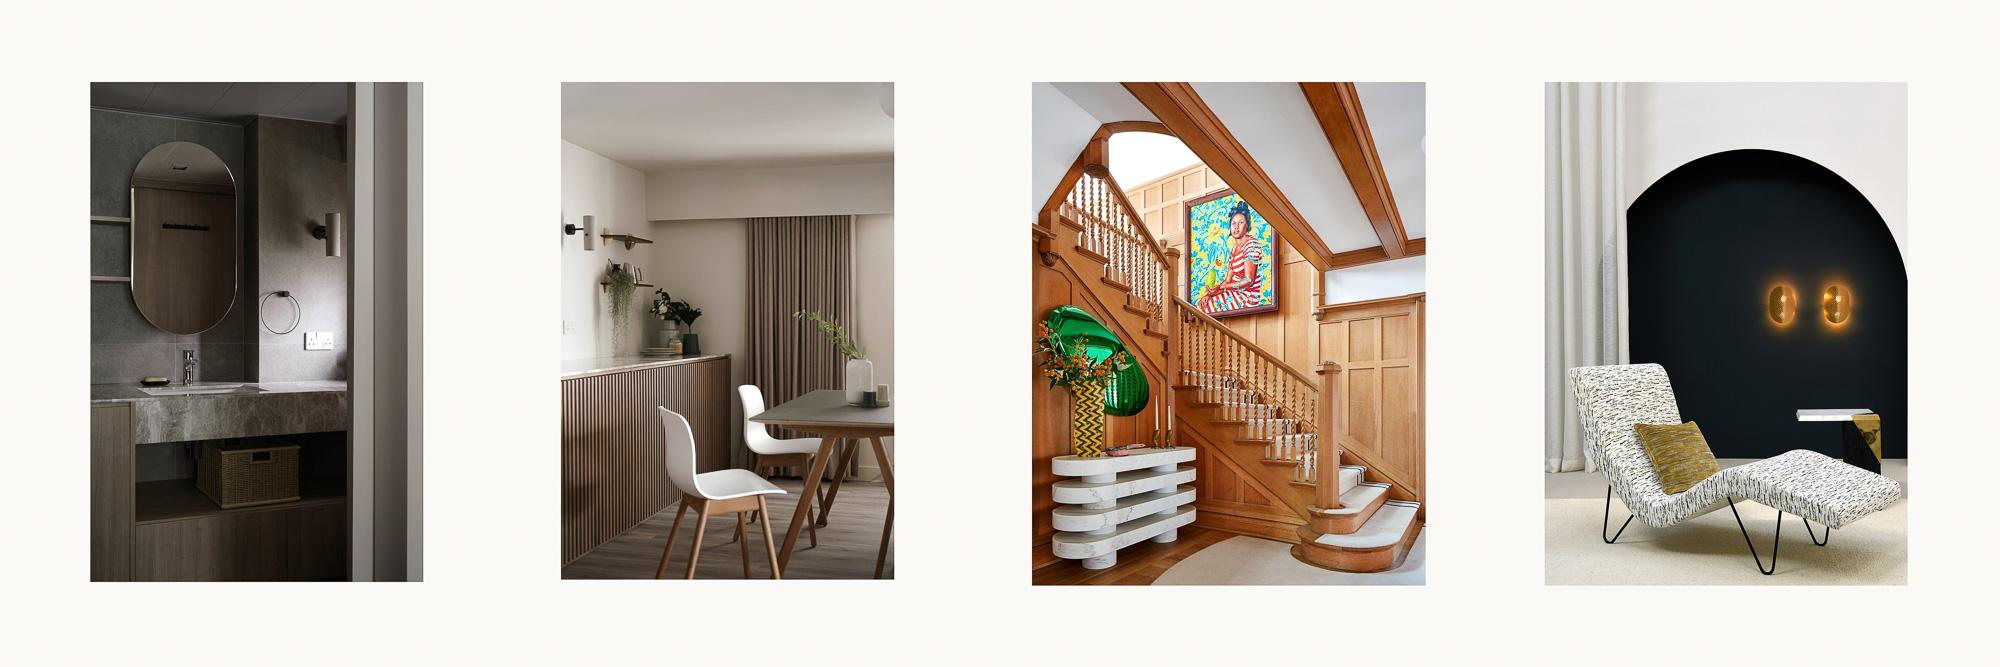 Home_Interiors_Savannah_Bay_Gallery